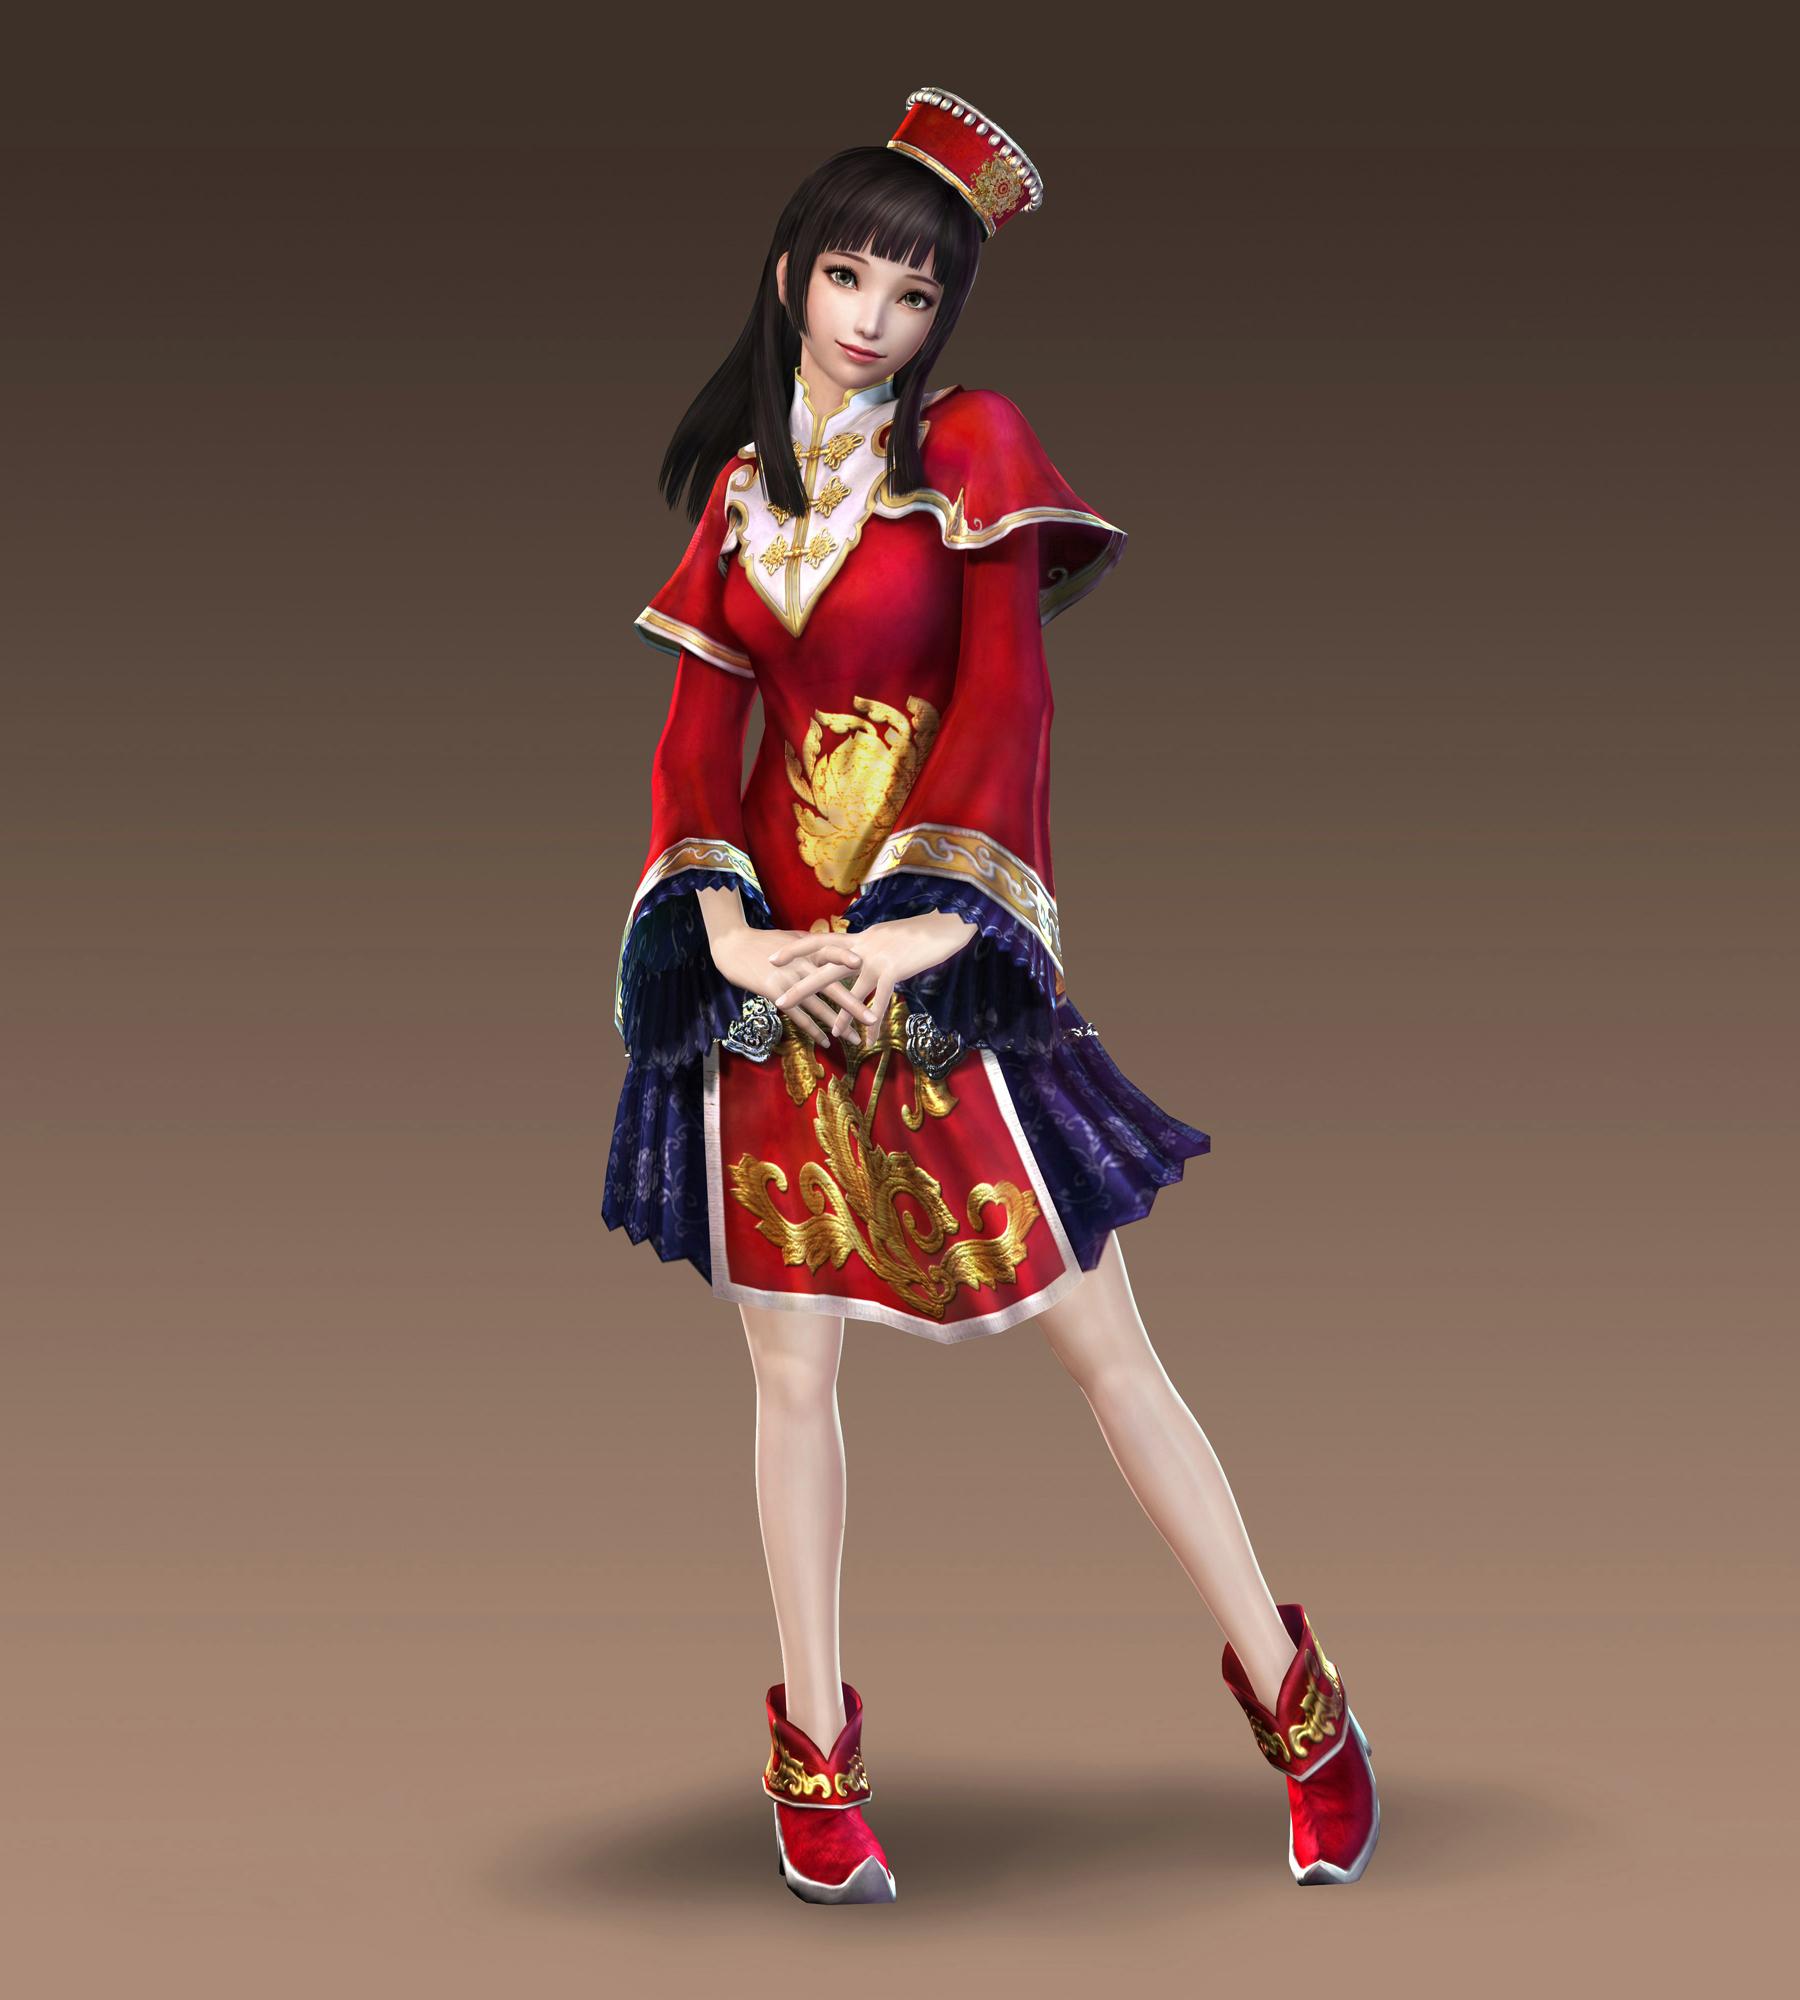 Warriors Orochi 3 Lian Shi: Dynasty/Samurai Warriors/ Warriors Orochi 3 RPs